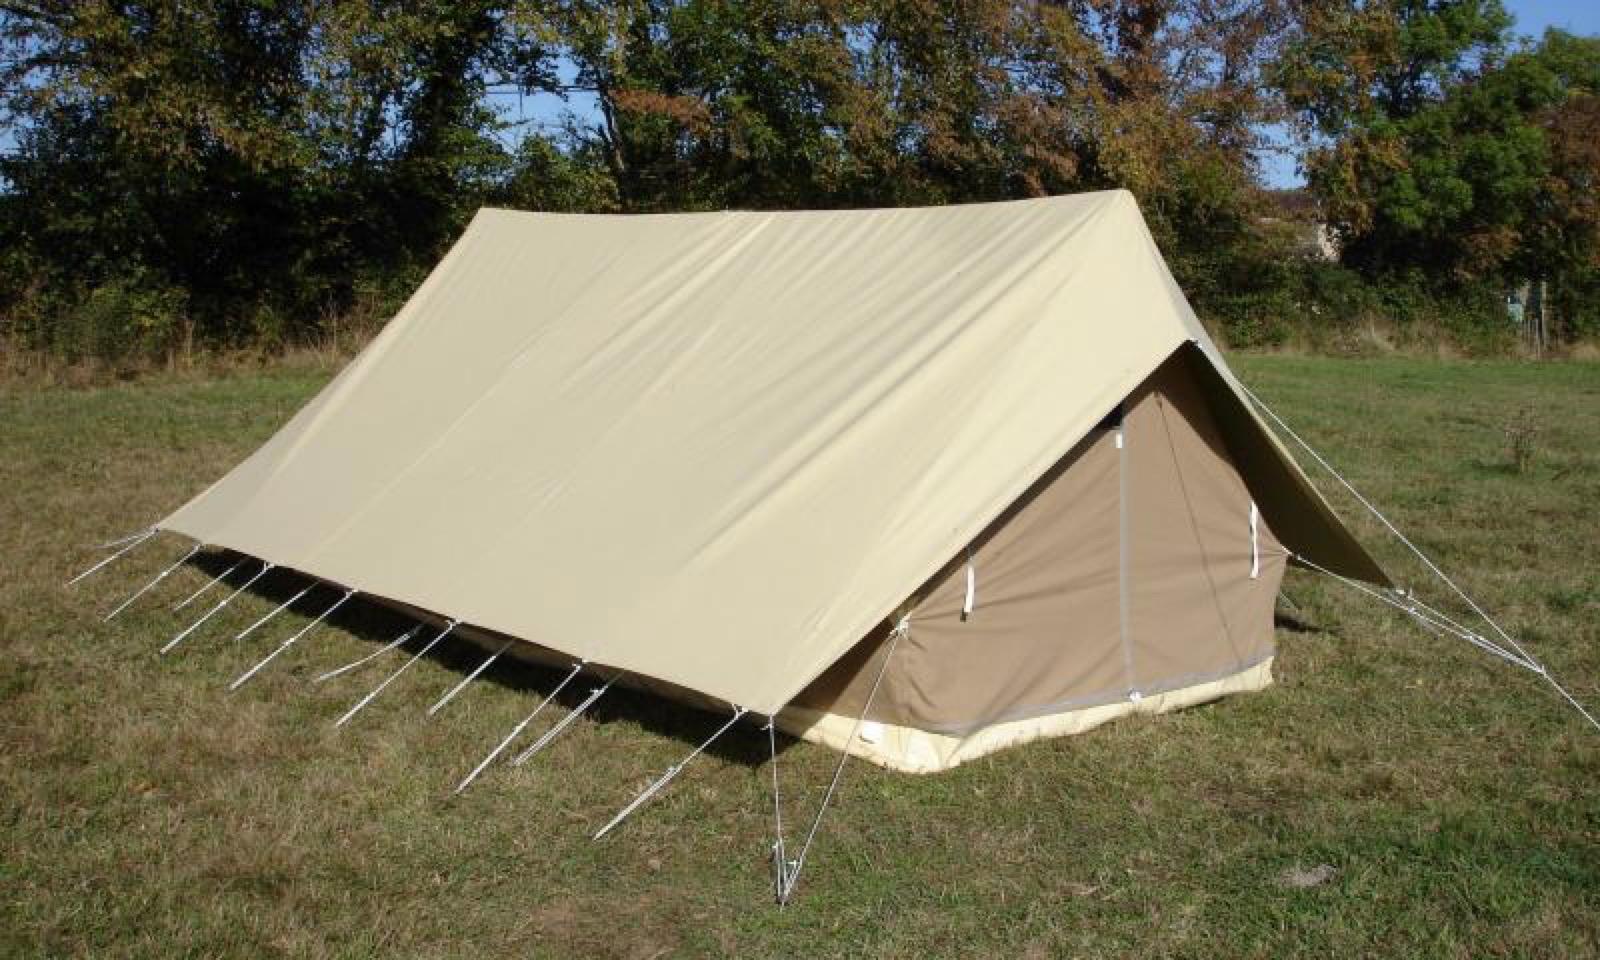 [Image: tente-canadienne-sportoza-equipement-et-...-sport.jpg]